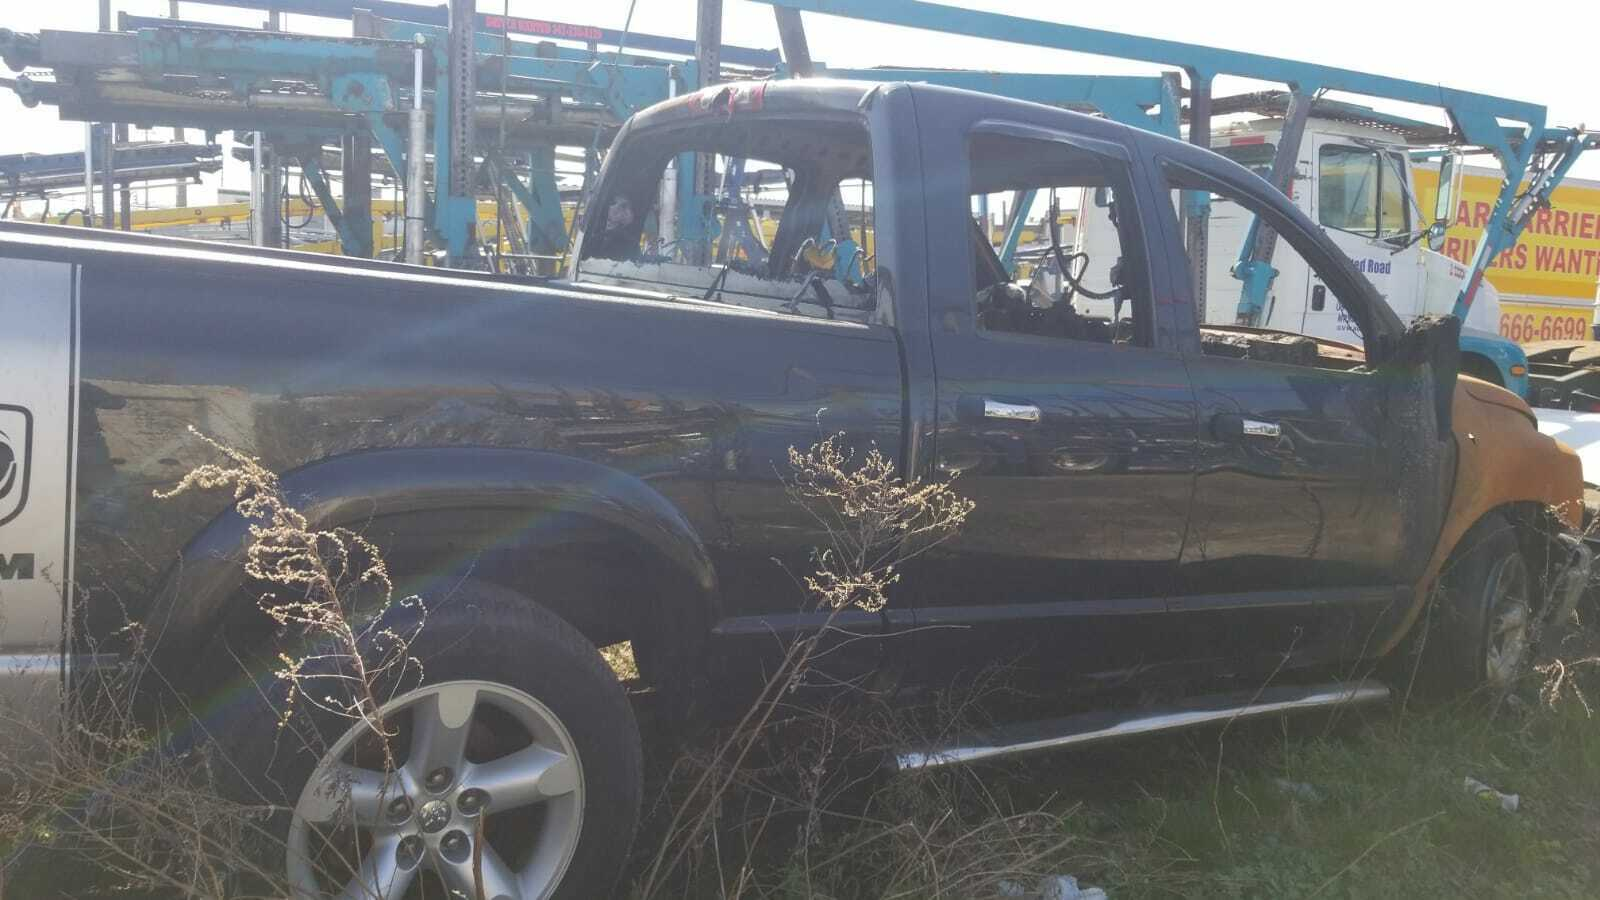 2007 Dodge Ram  Fire damage pick-up truck BIG HORN